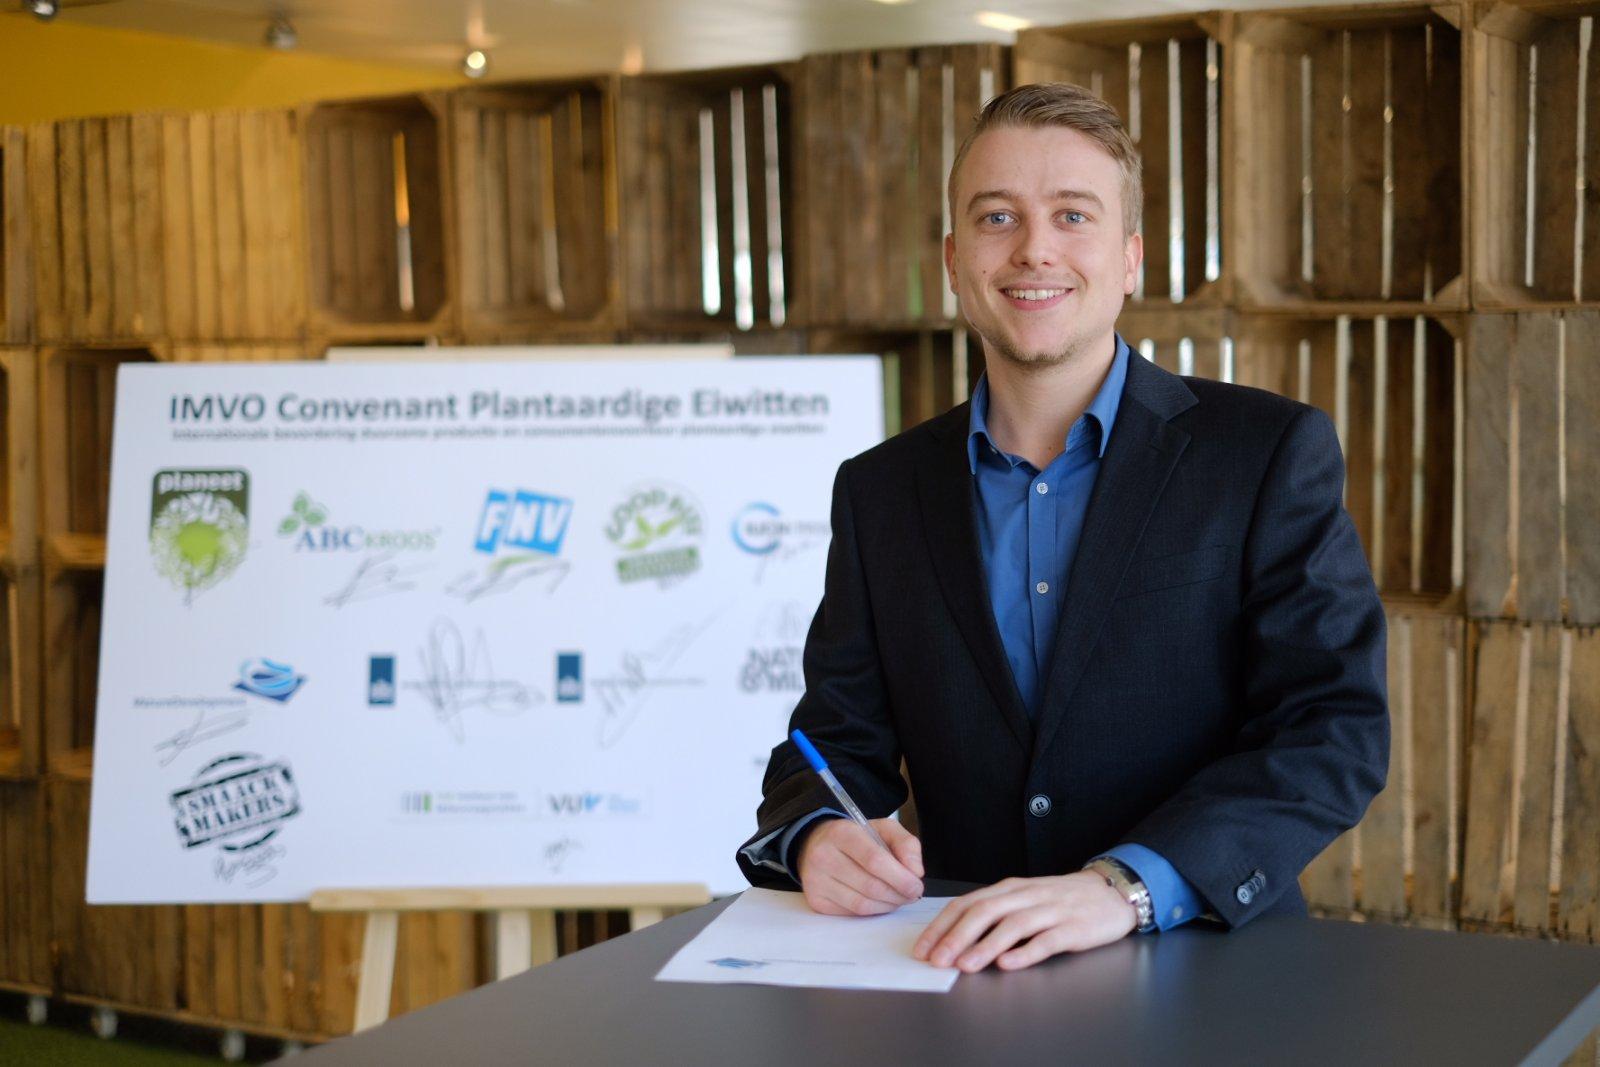 ondertekening IMVO-convenant Wesley Malcorps 2